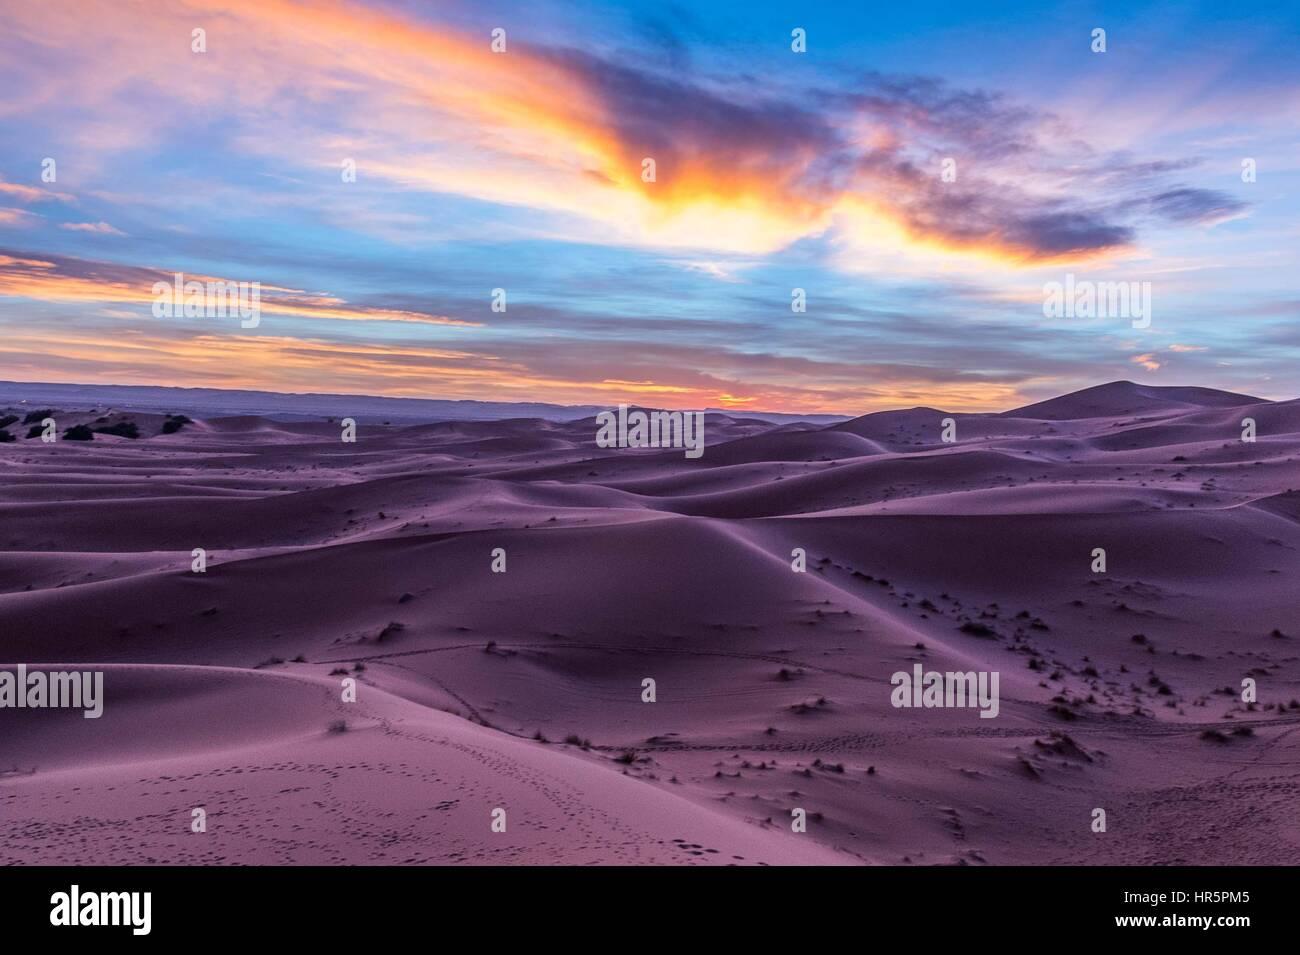 Pink colour for sunset in the Sahara desert - Stock Image